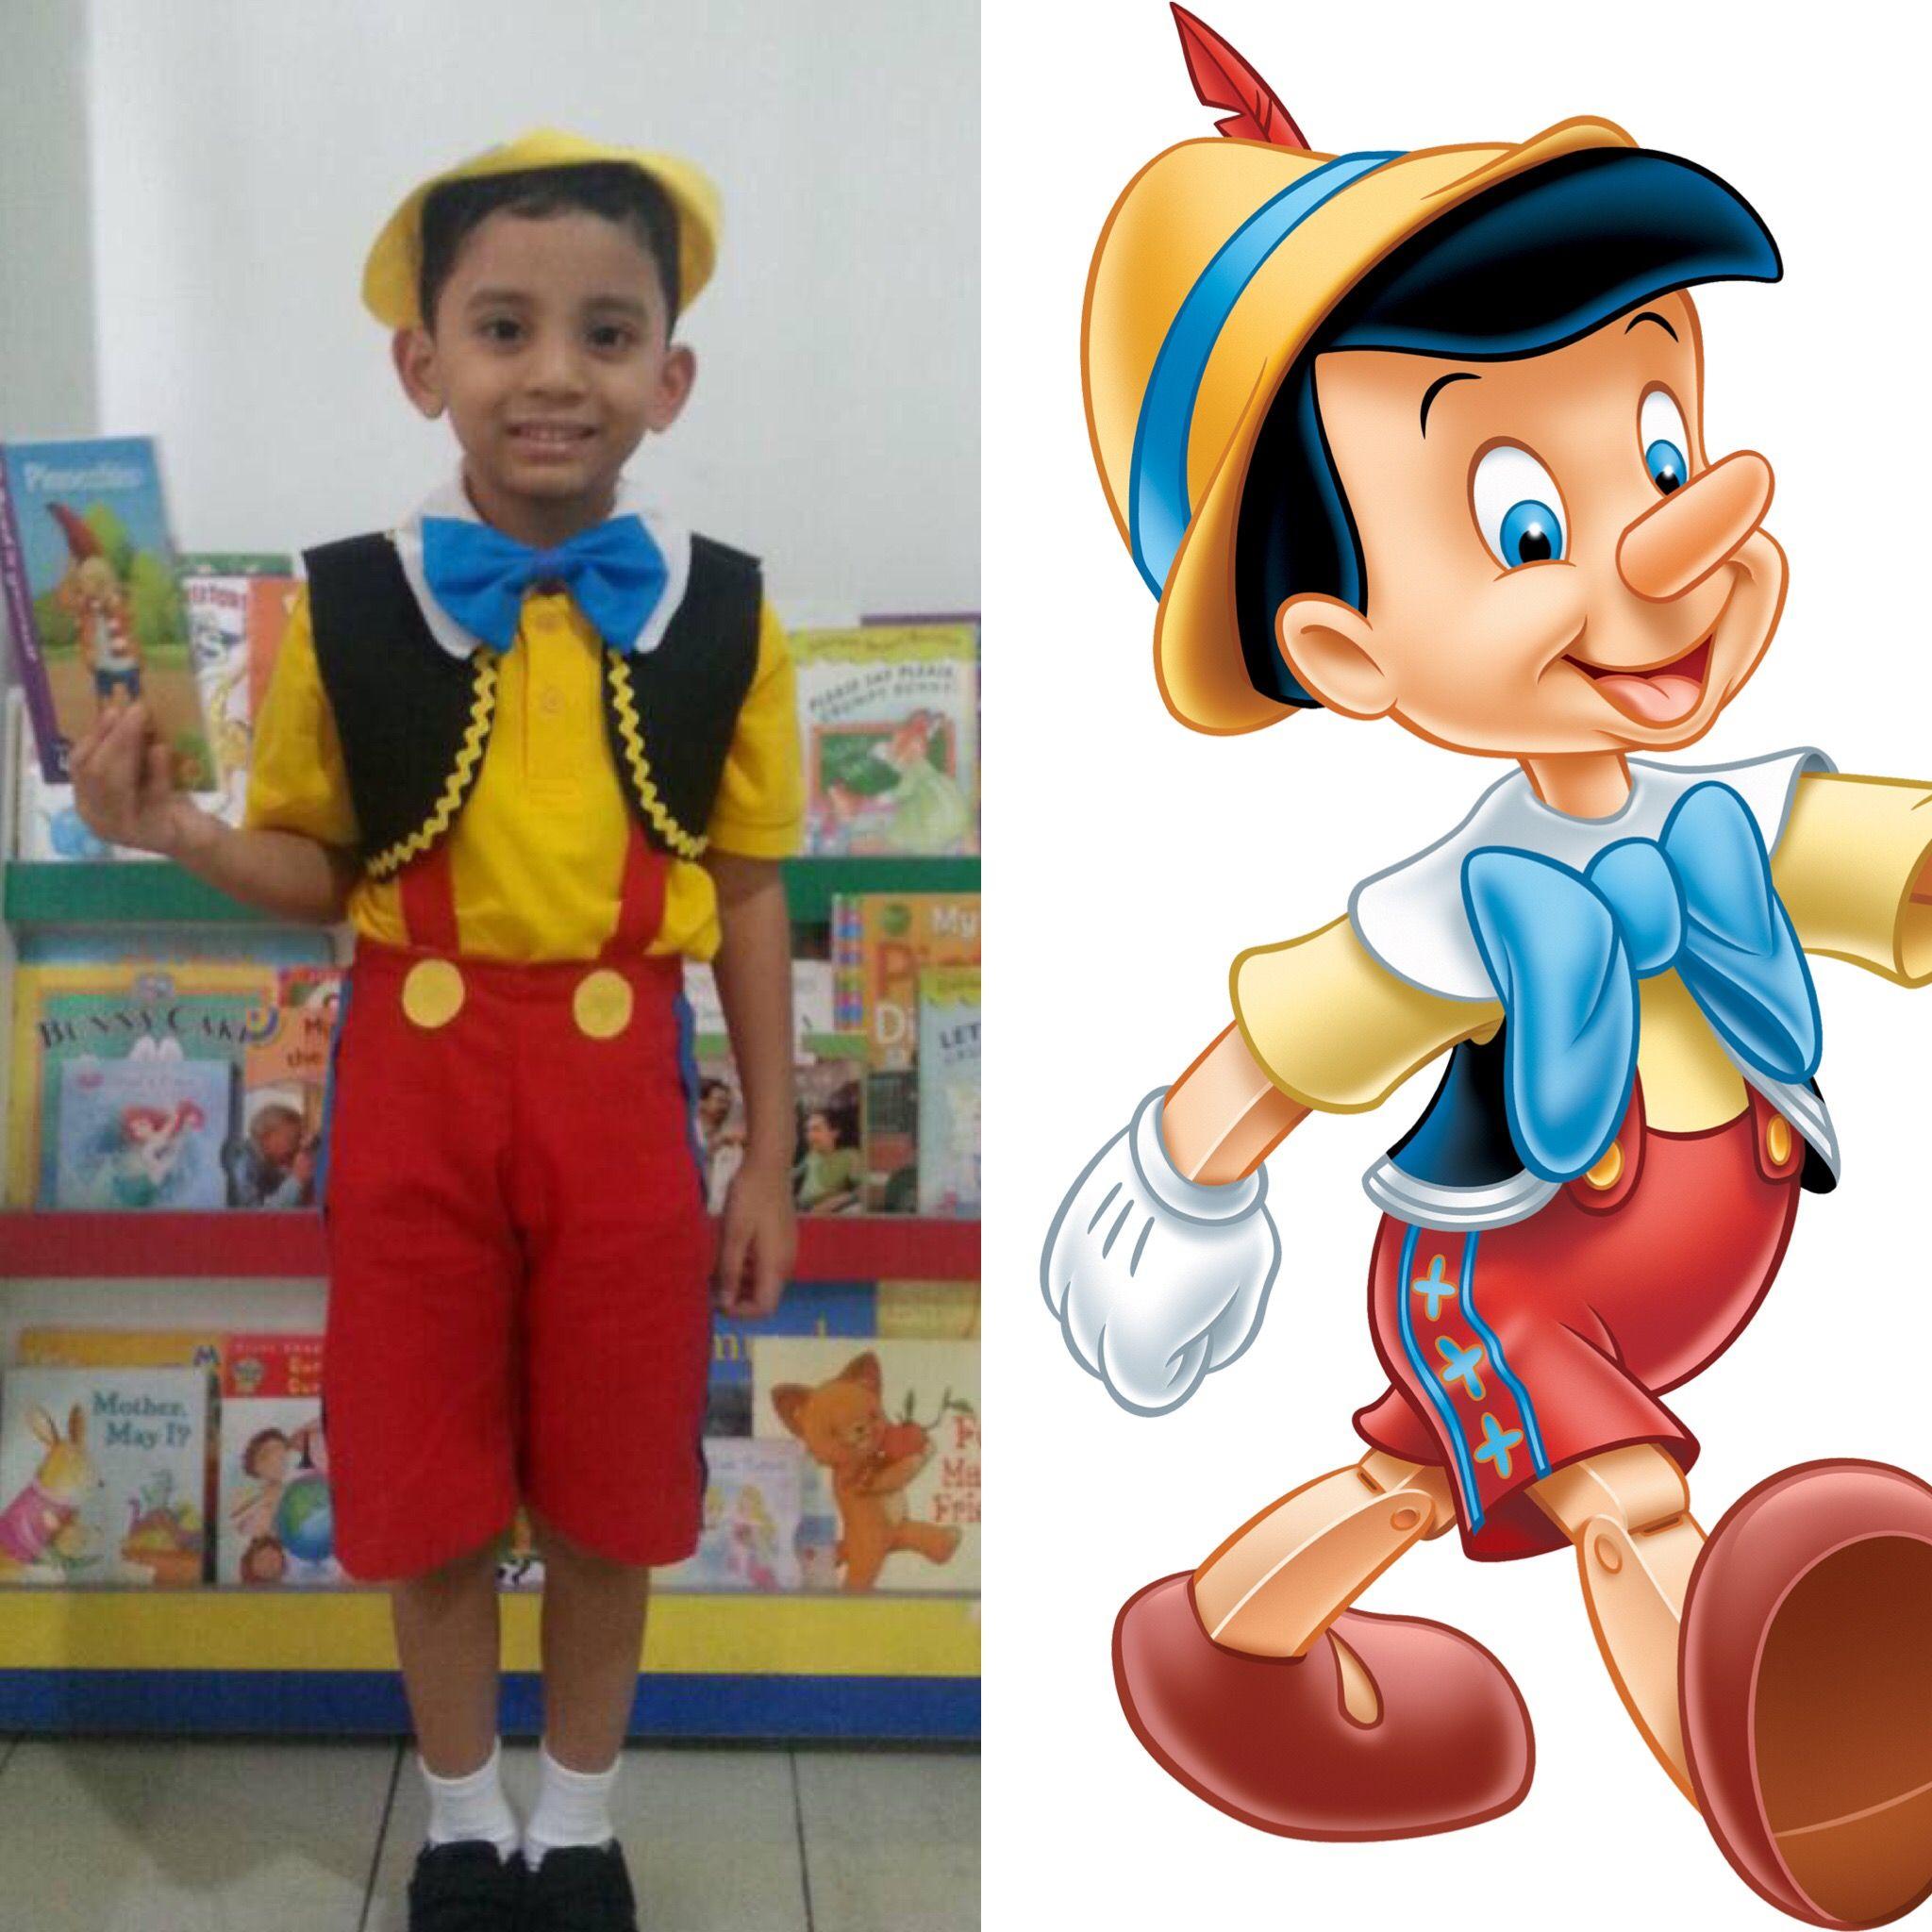 ... kids costumes pinocchio and cricket · pinocchio costume diy ...  sc 1 st  Best Kids Costumes & Pinocchio Costume Kids - Best Kids Costumes